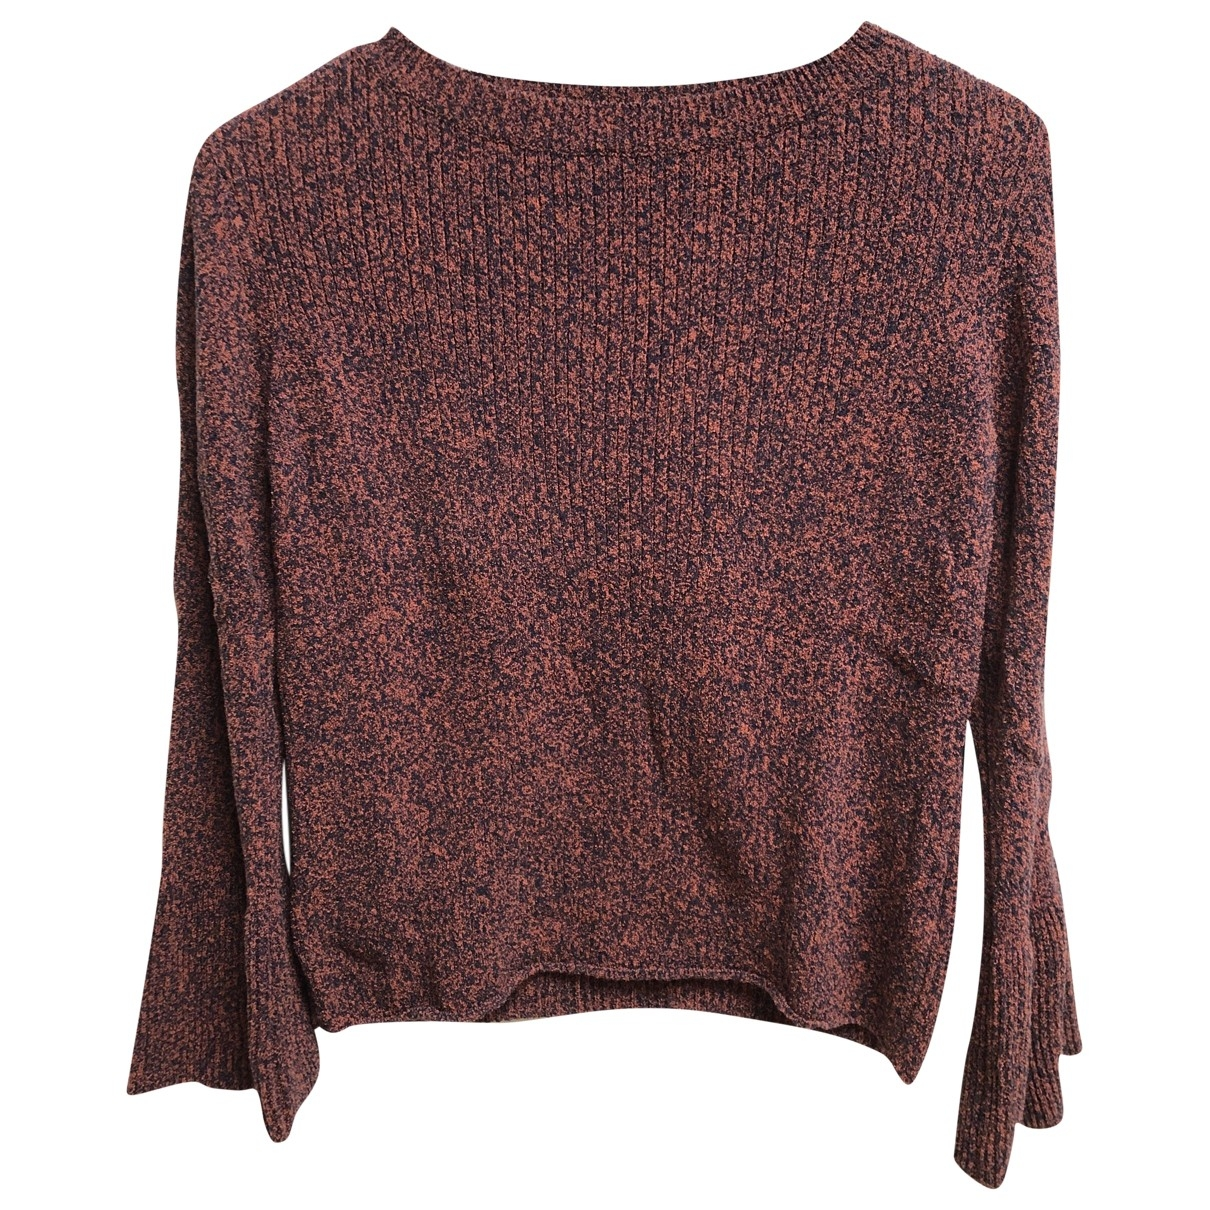 Mih Jeans \N Multicolour Cotton Knitwear for Women XS International